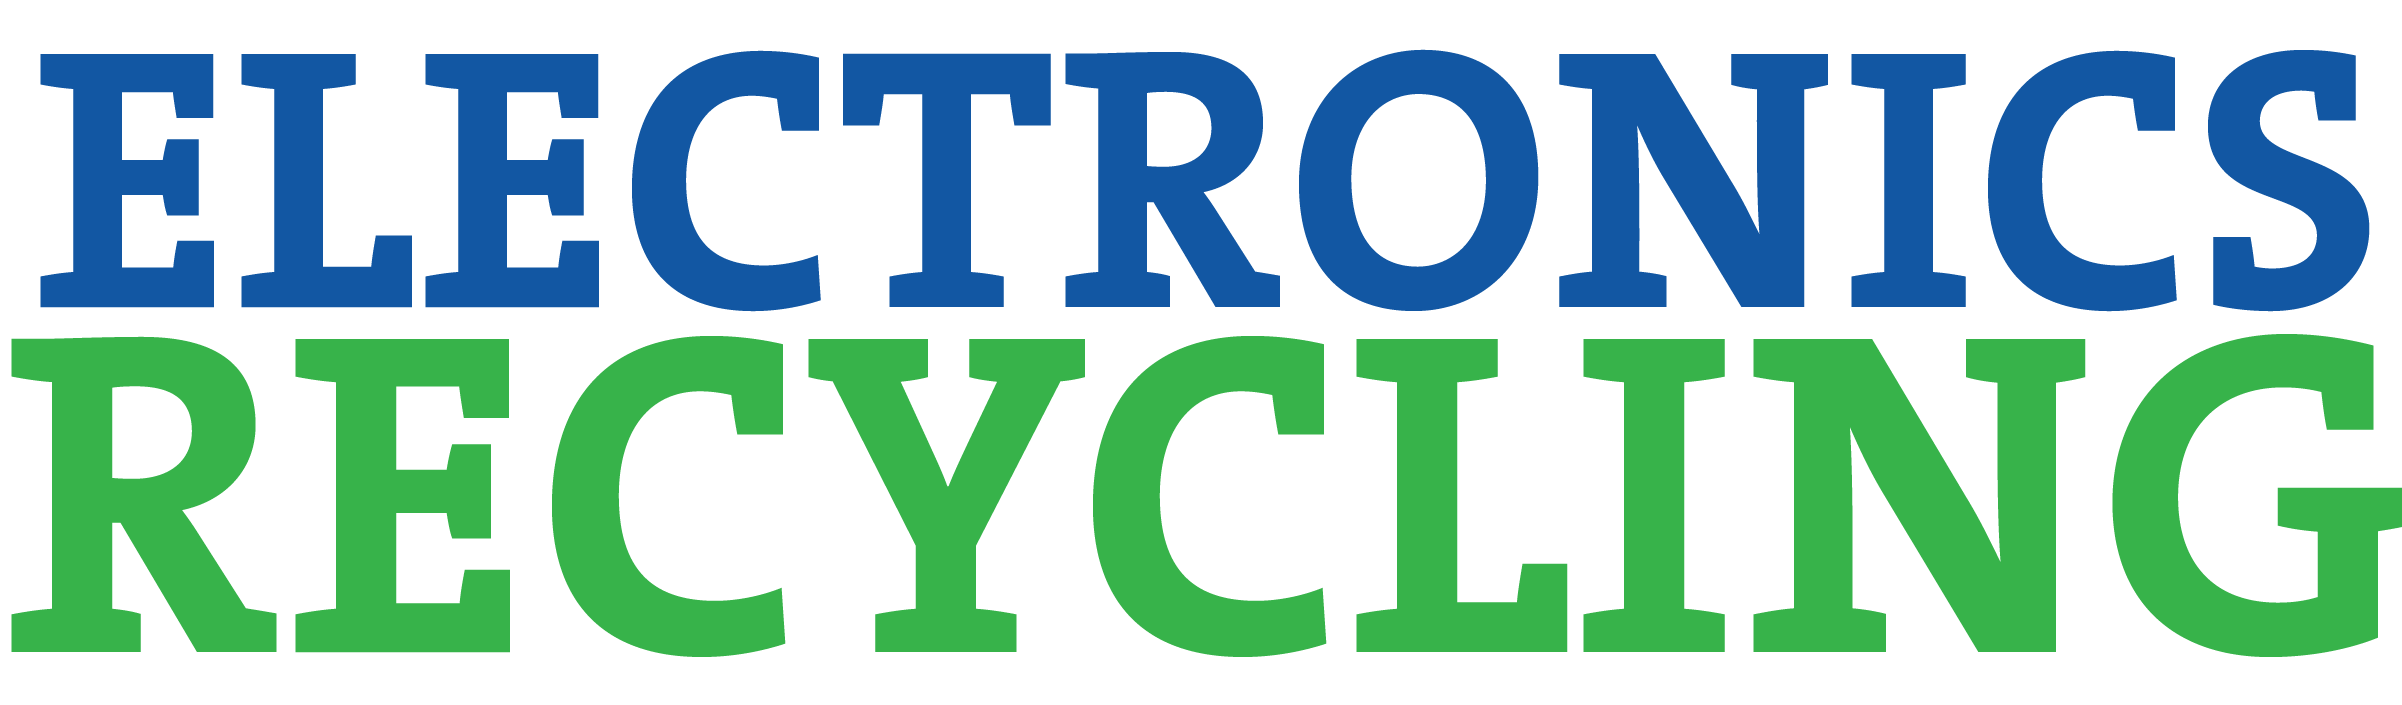 Ecycle_website_header_onlywords